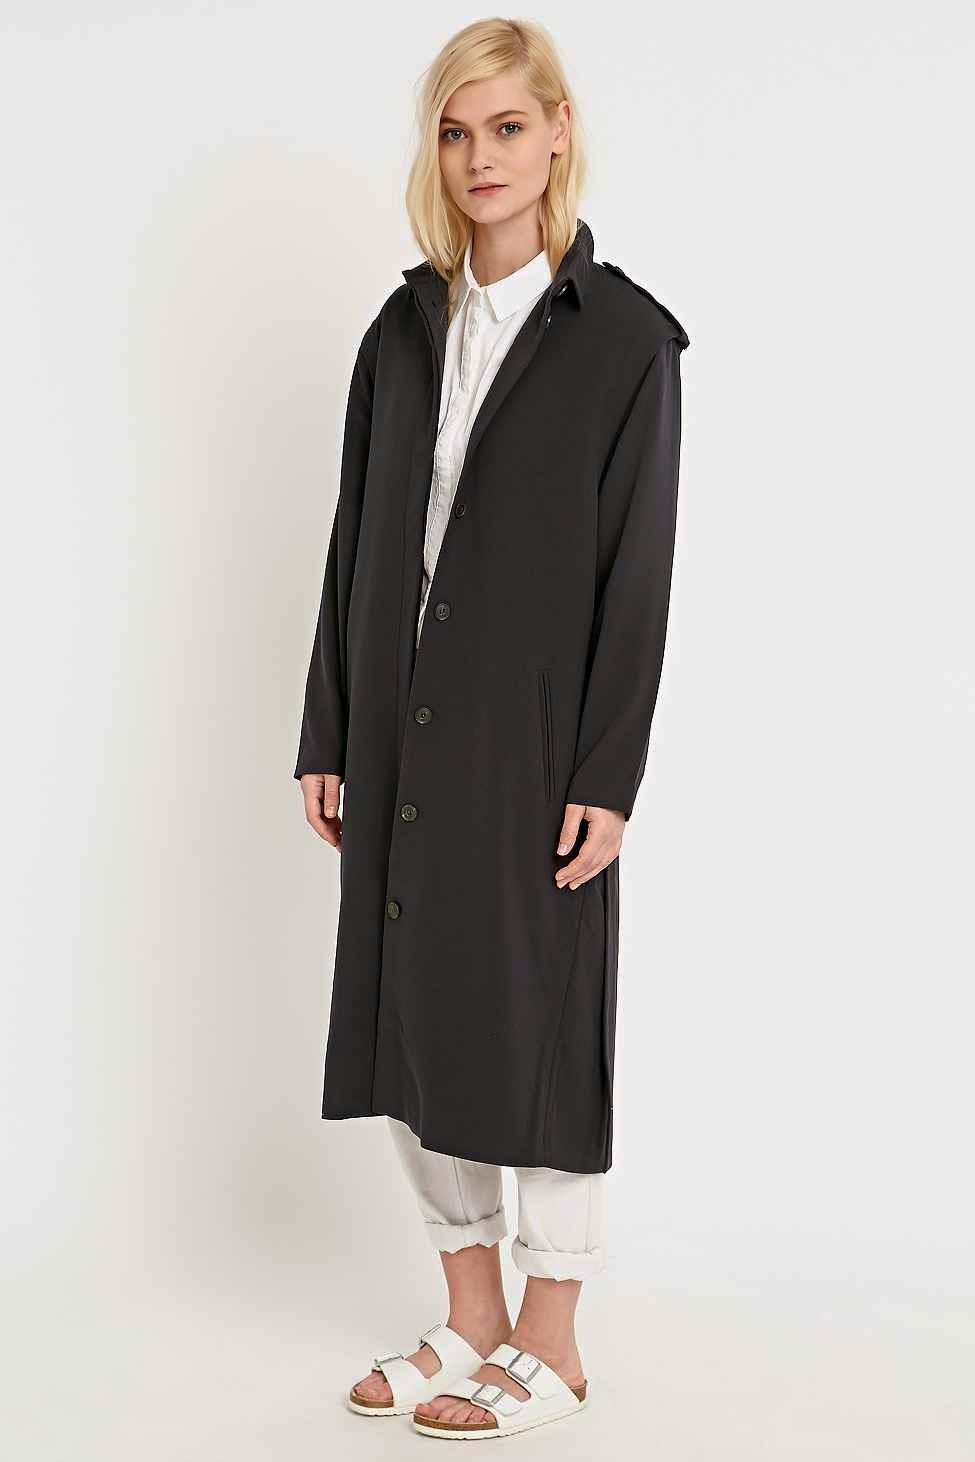 urban outfitters long black coat, selected femme black coat